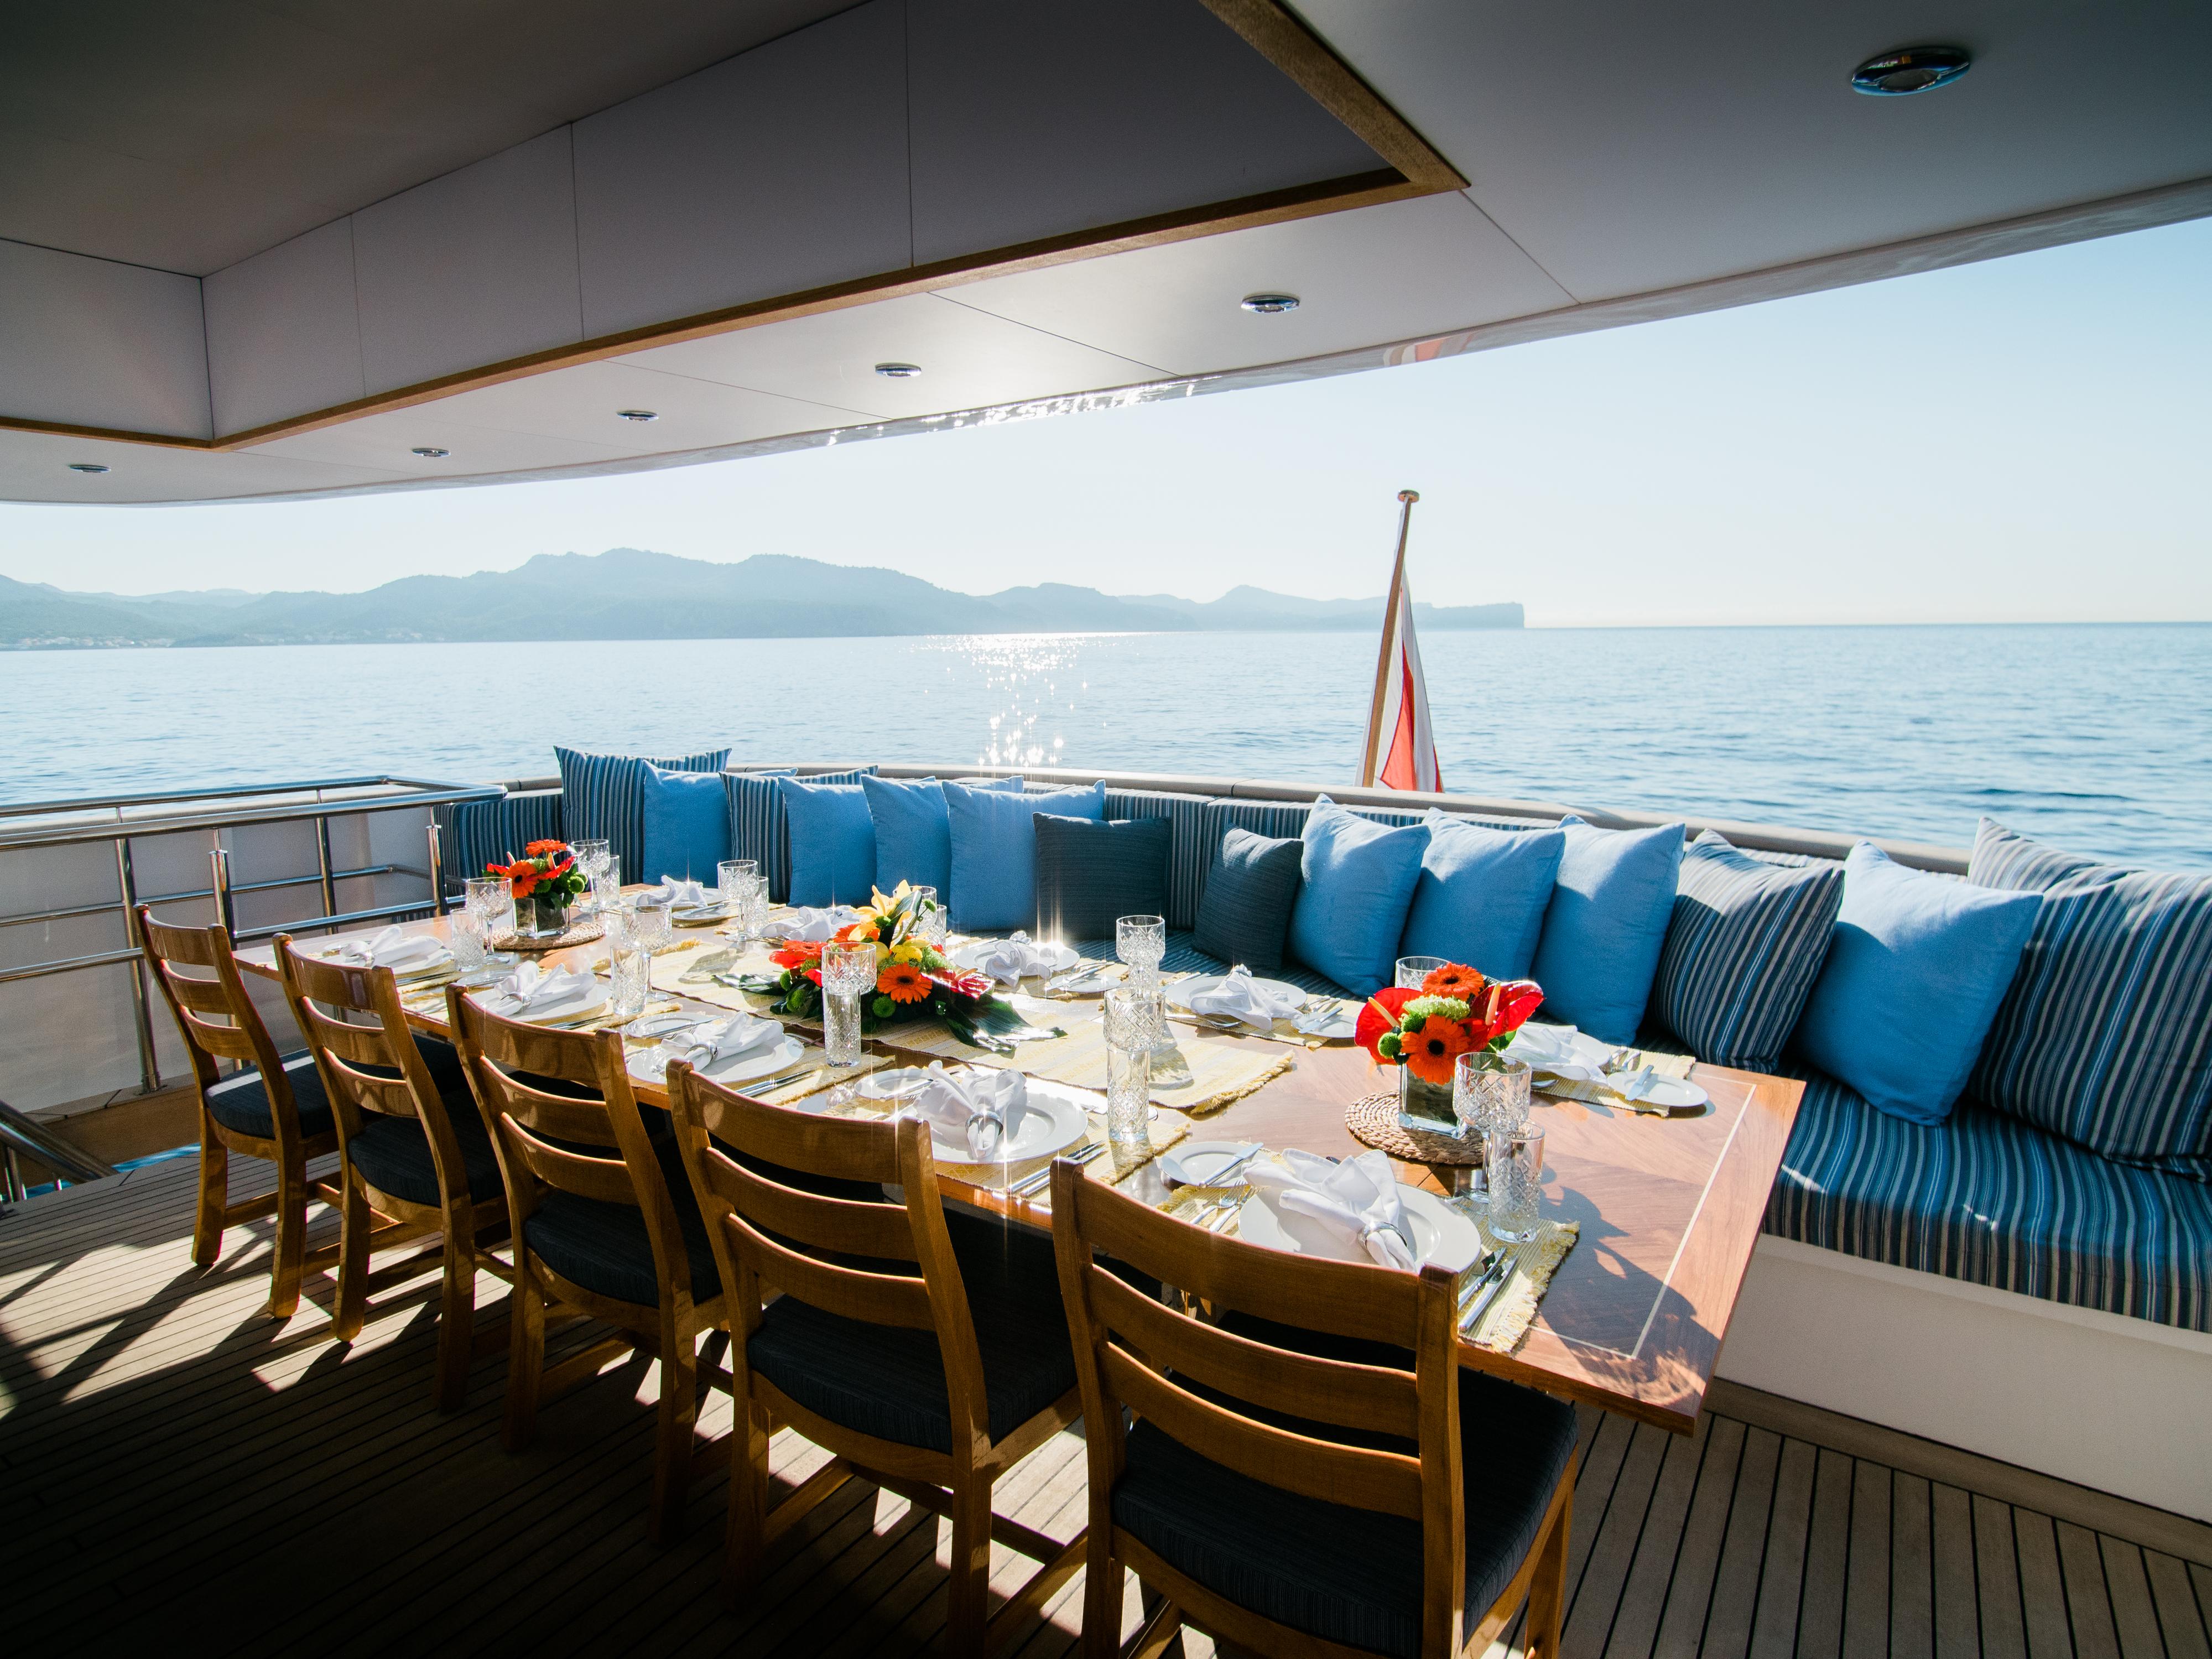 Al fresco dining on the aft deck